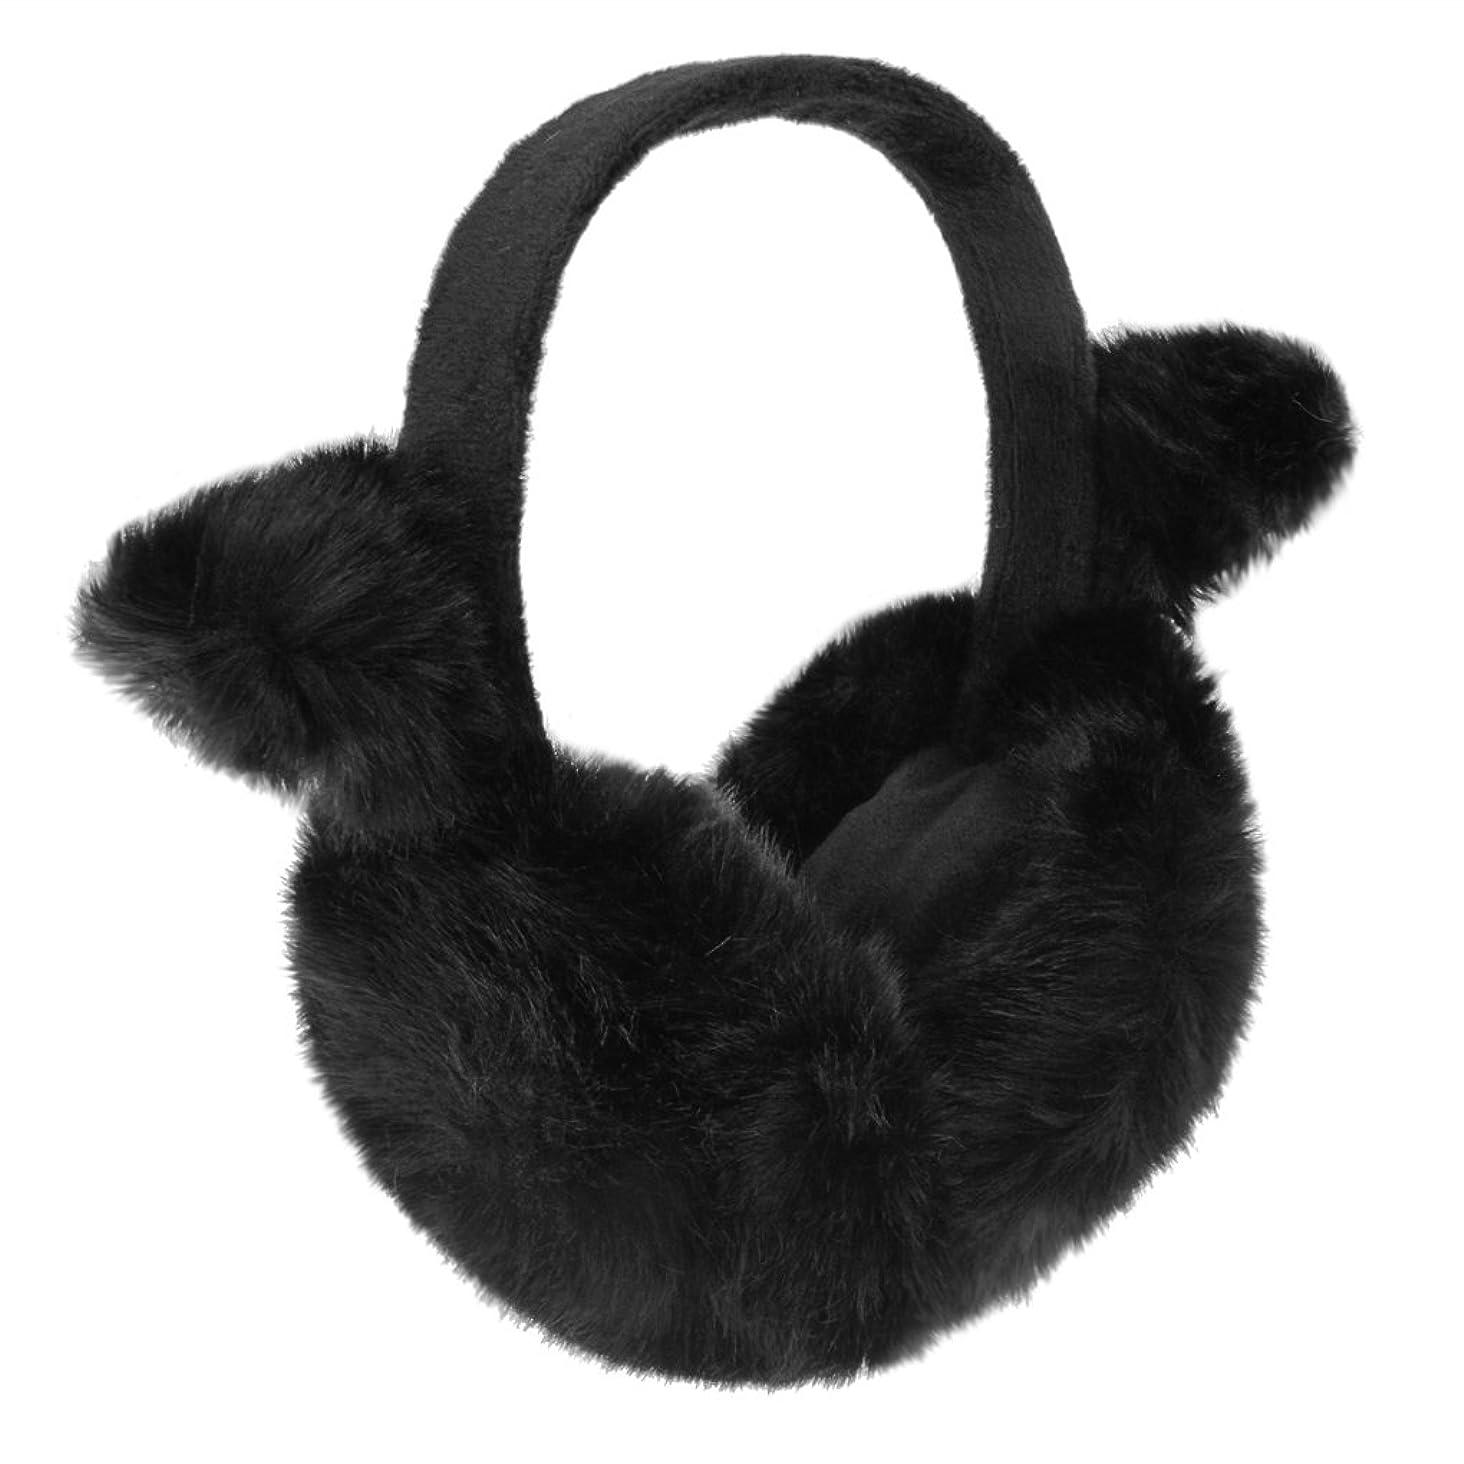 Women Girl Faux Fur Earmuffs Earwarmers Ear Muffs Earlap Snow Cycling Ear Cover